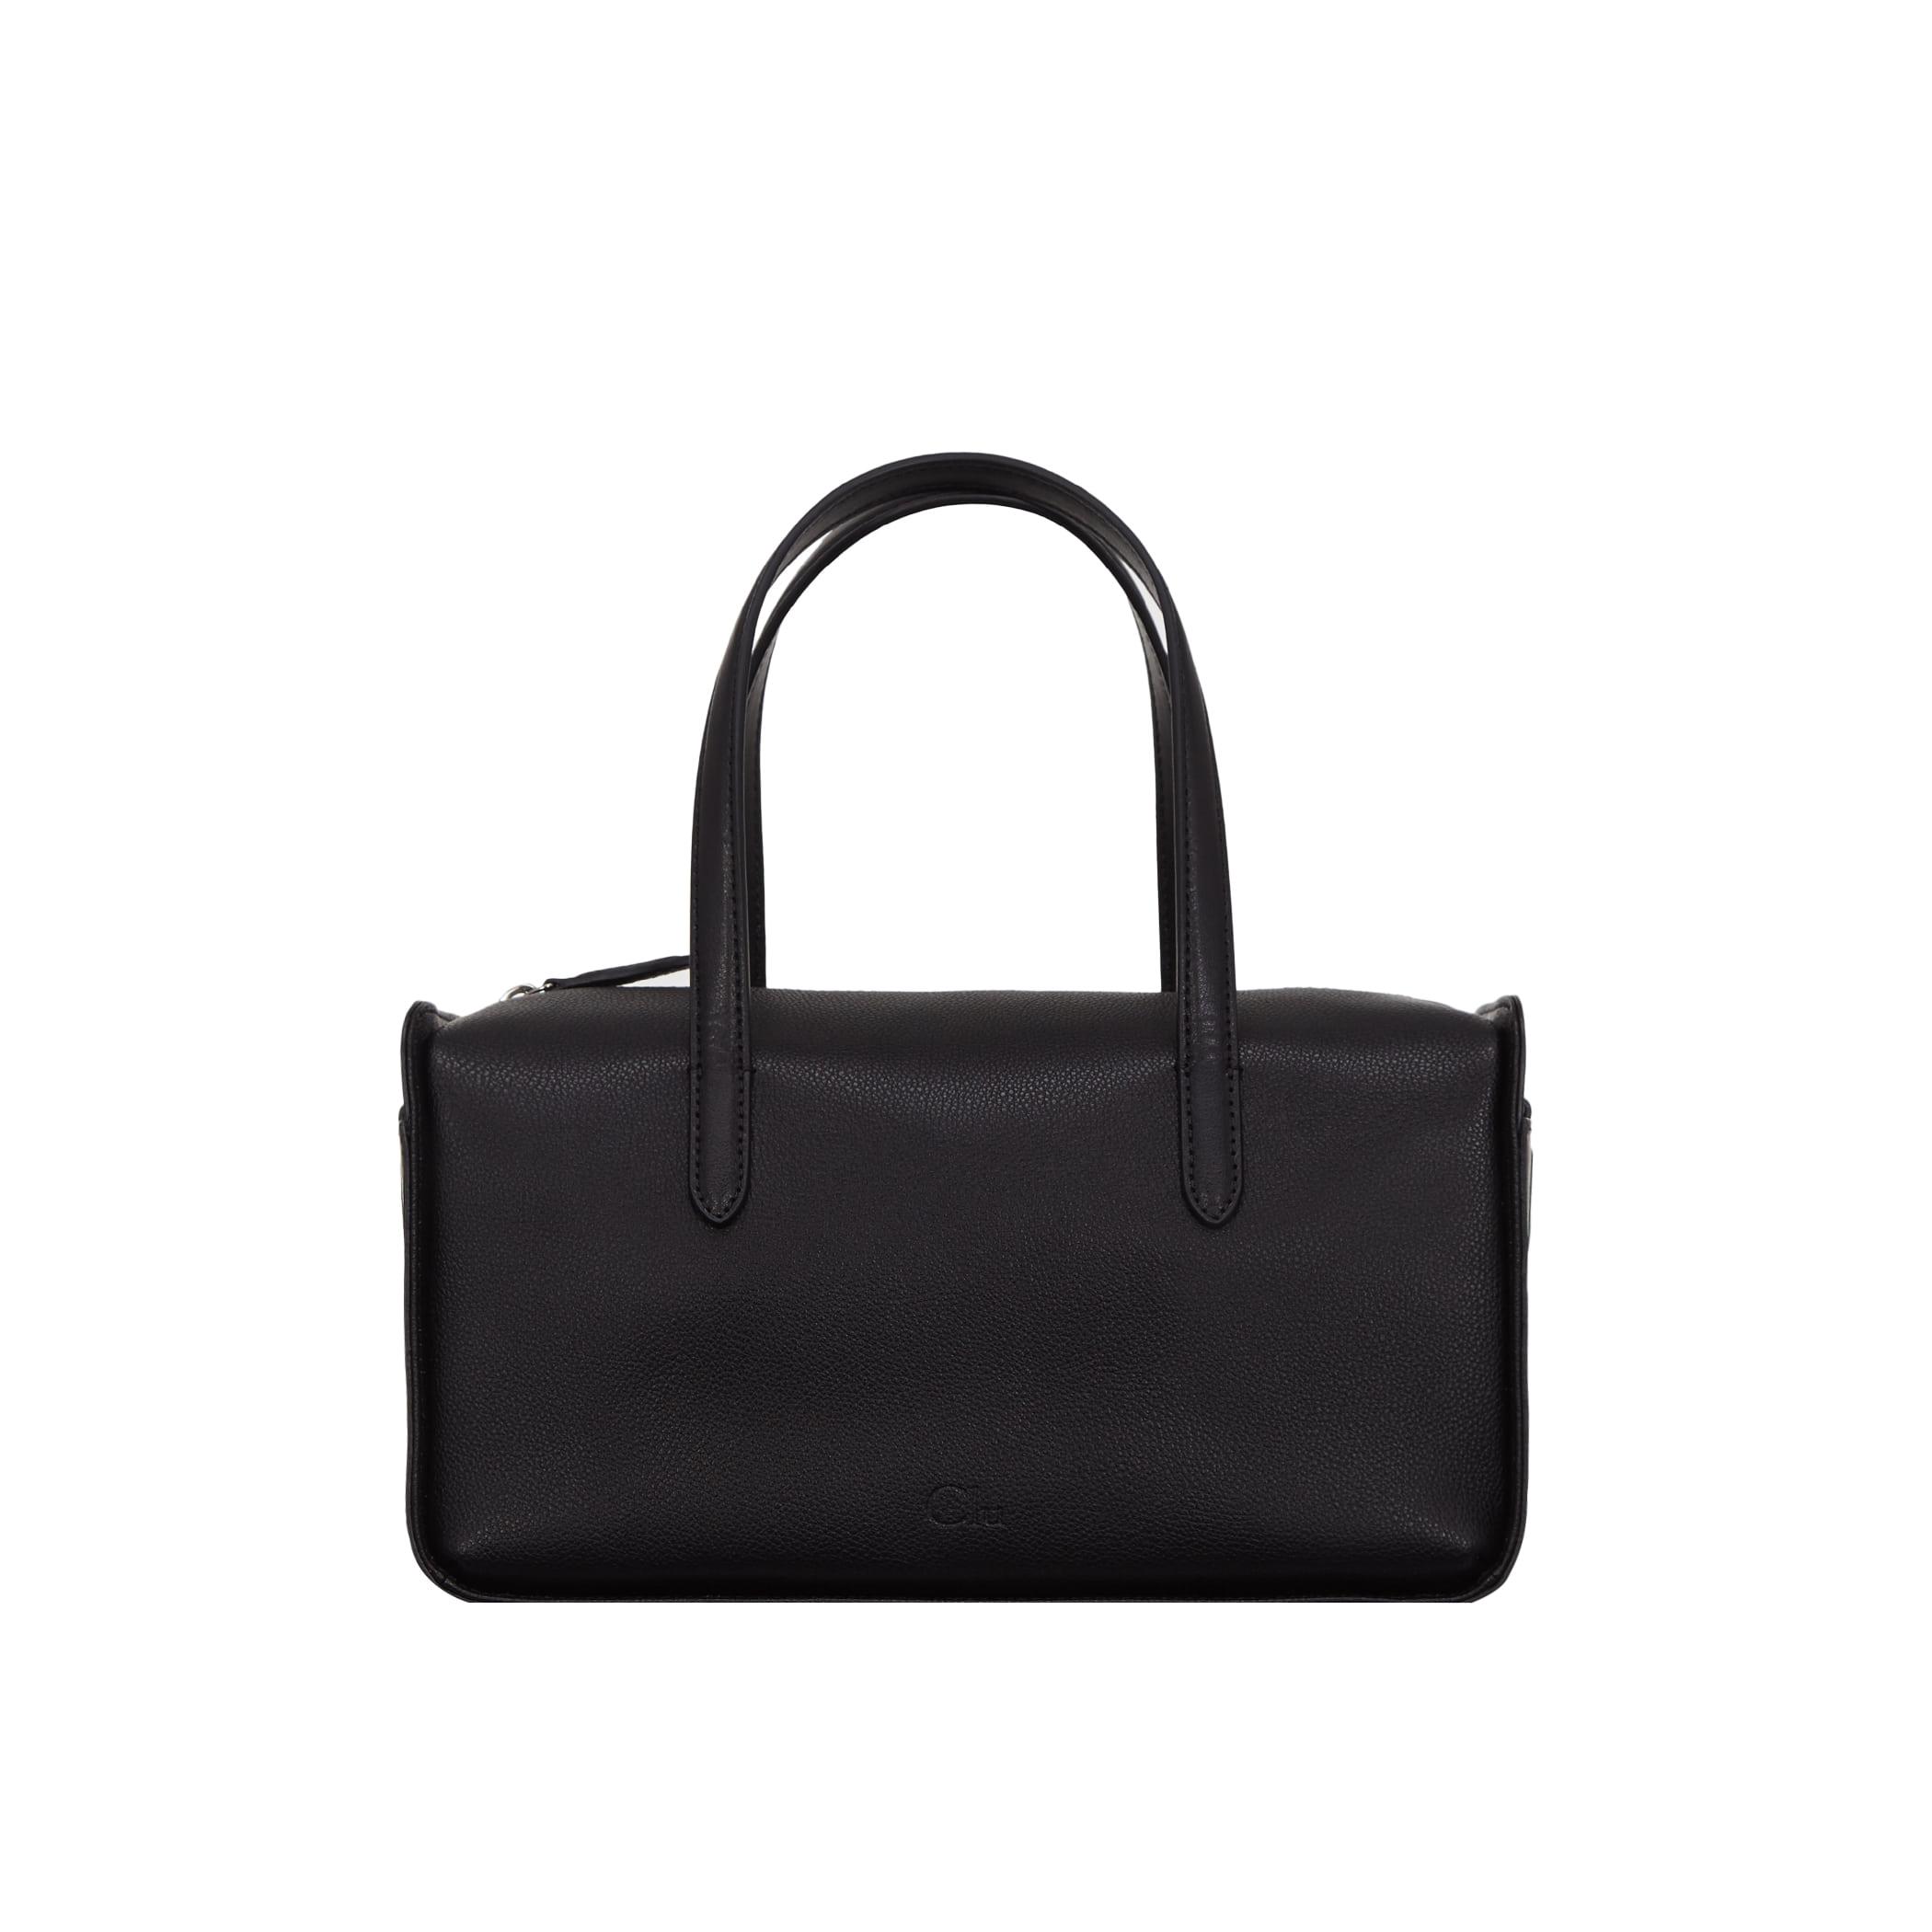 Clu_FLOCK BOSTON BAG IN BLACK